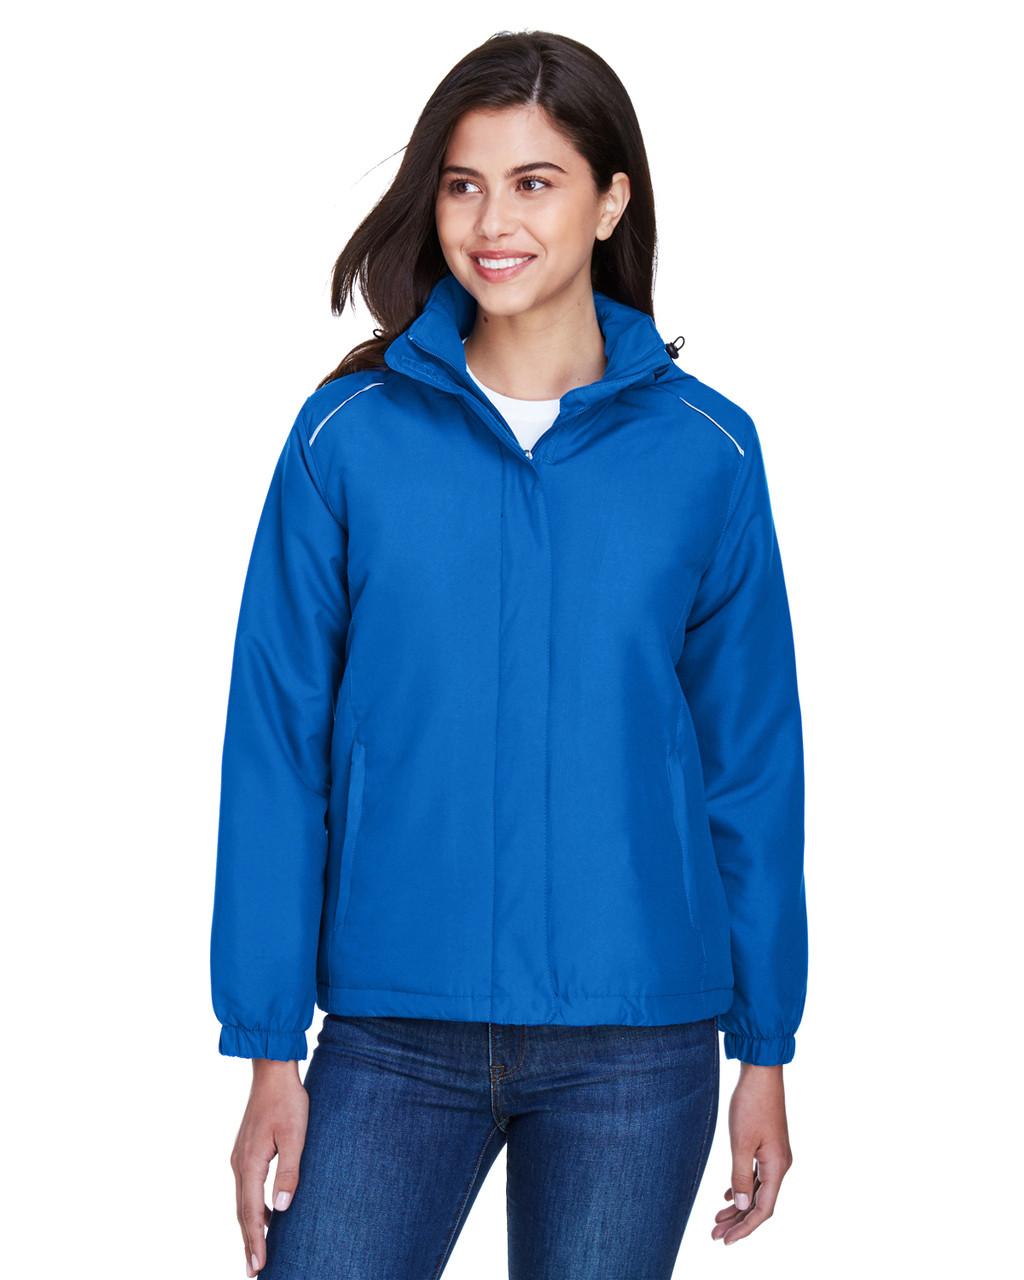 96c28acd23e Ash City - Core 365 78189 Ladies' Brisk Insulated Jacket